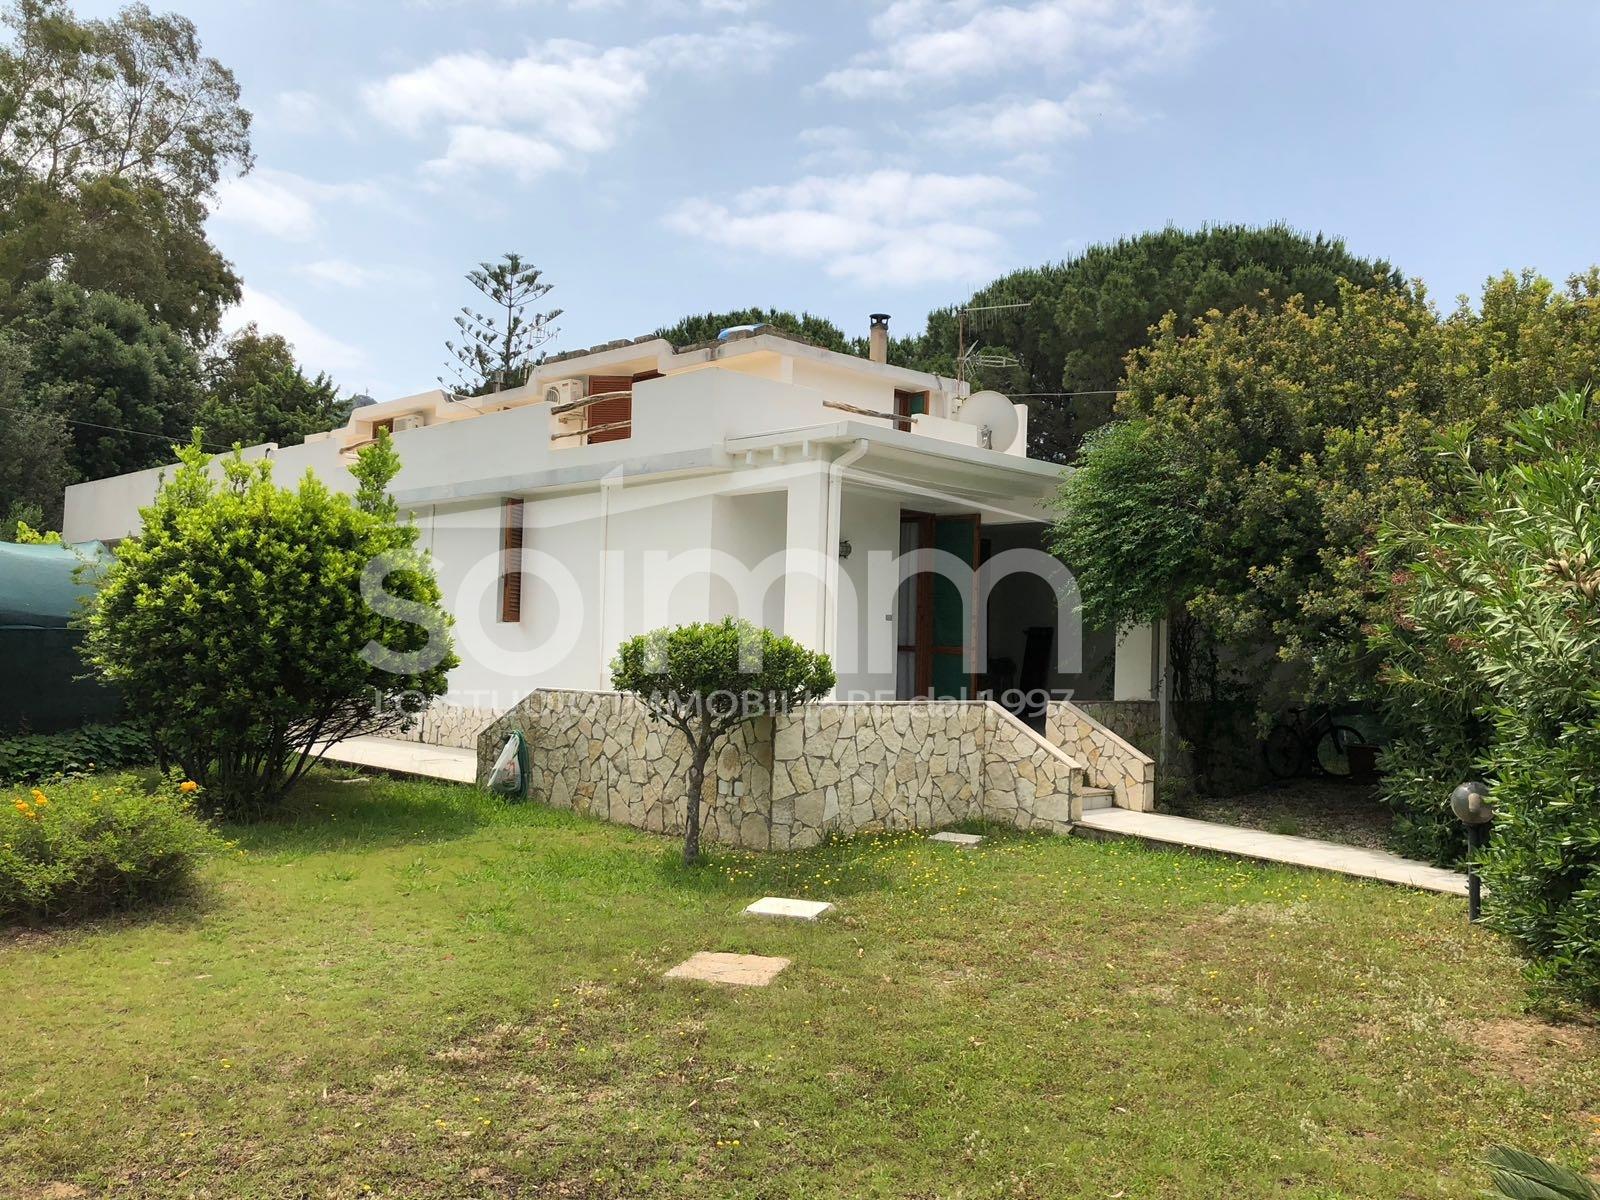 Villa Caposchiera in Vendita a Maracalagonis - Cod. ao114